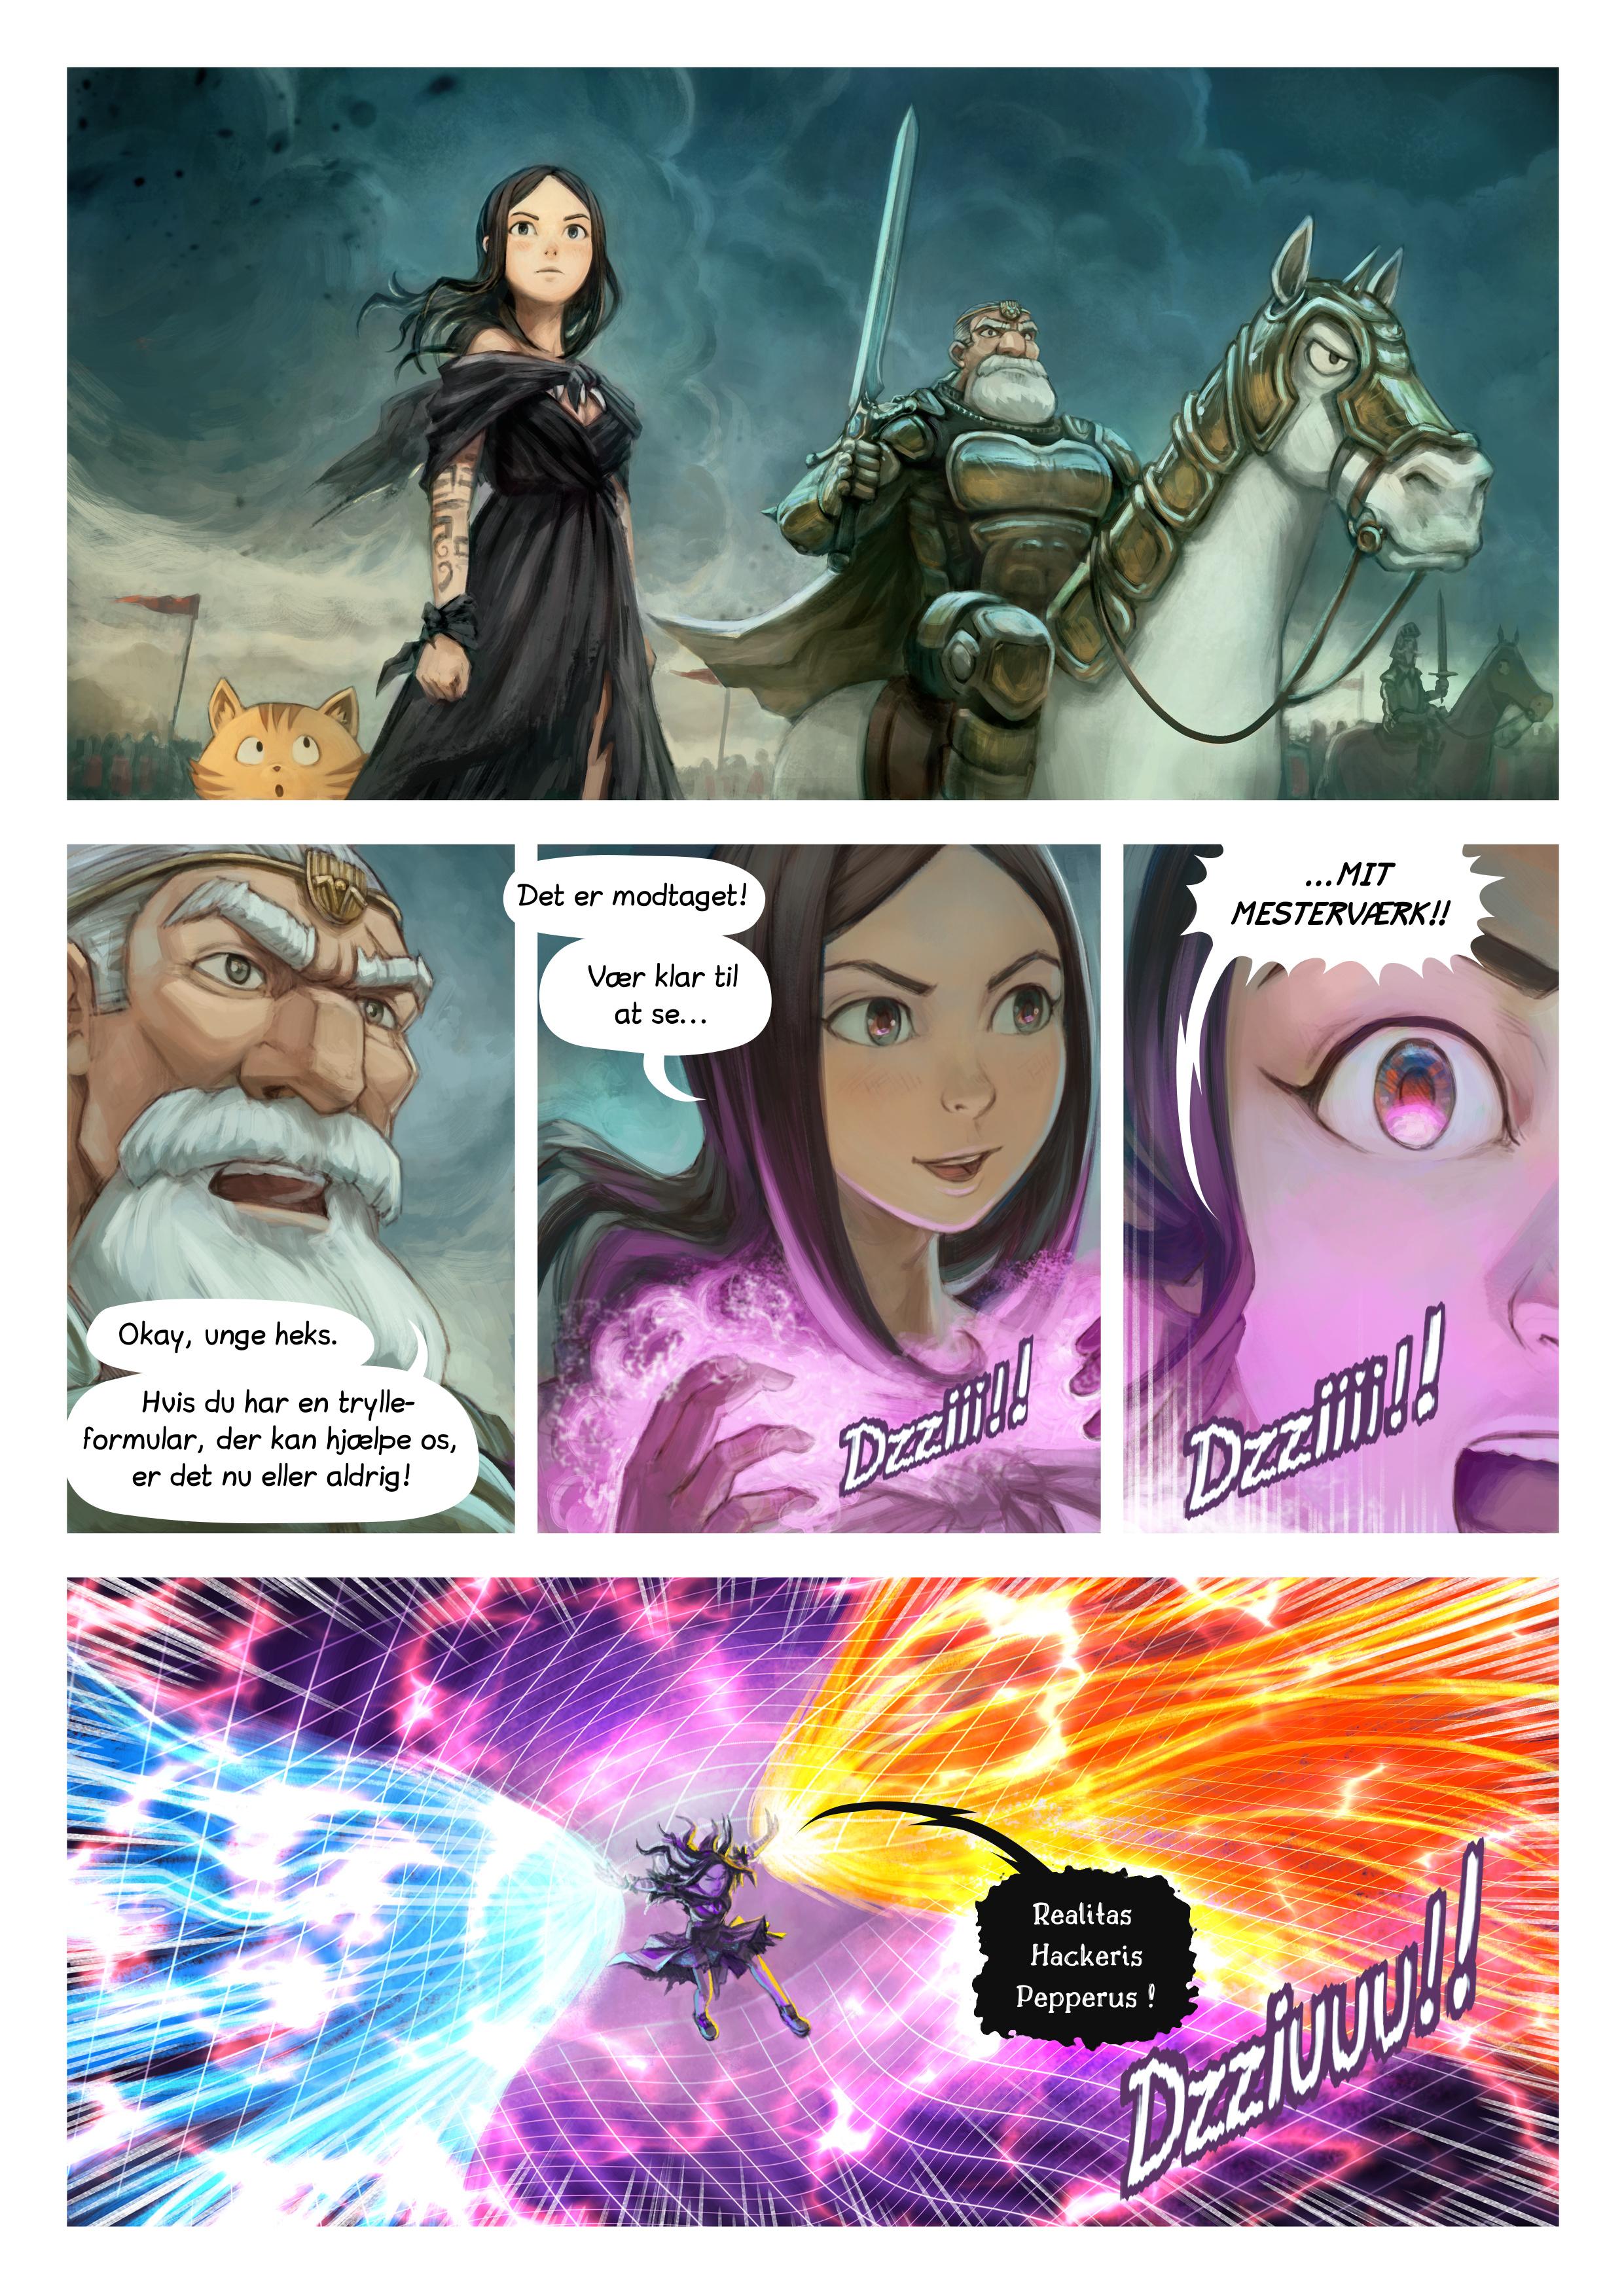 Episode 33: Krigs-trylleformularen, Page 2